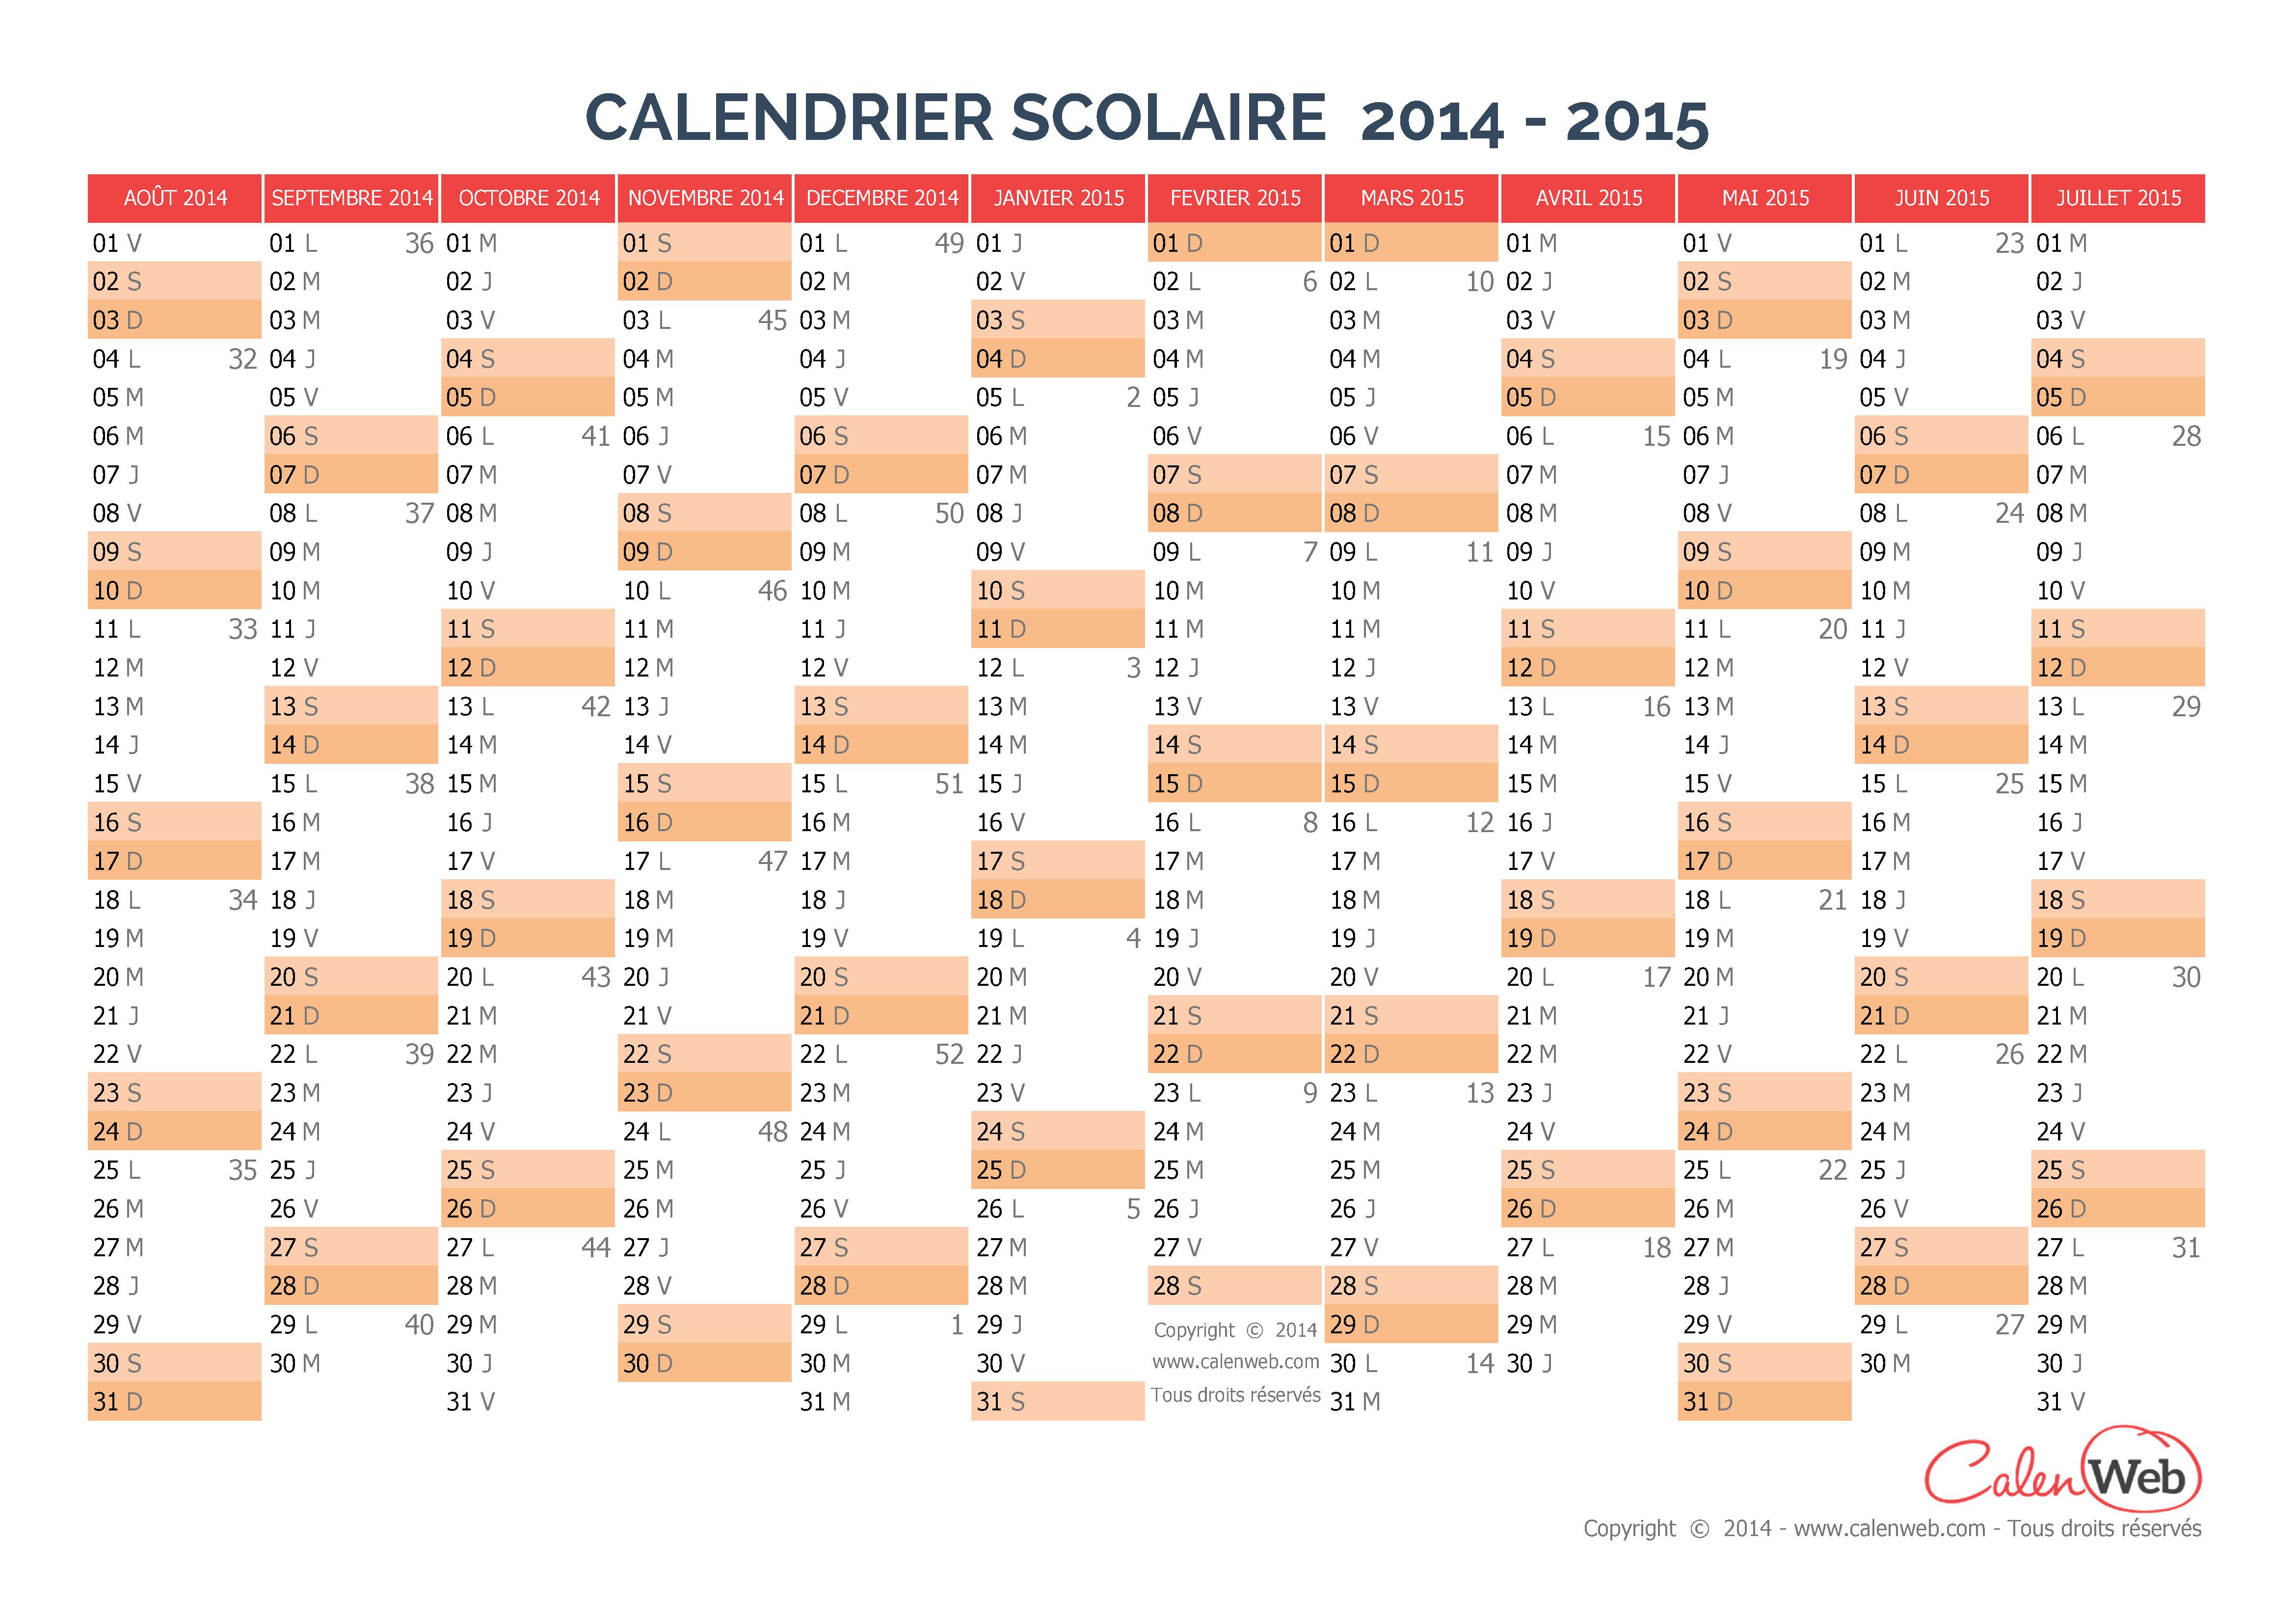 Calendrier scolaire 2014/2015